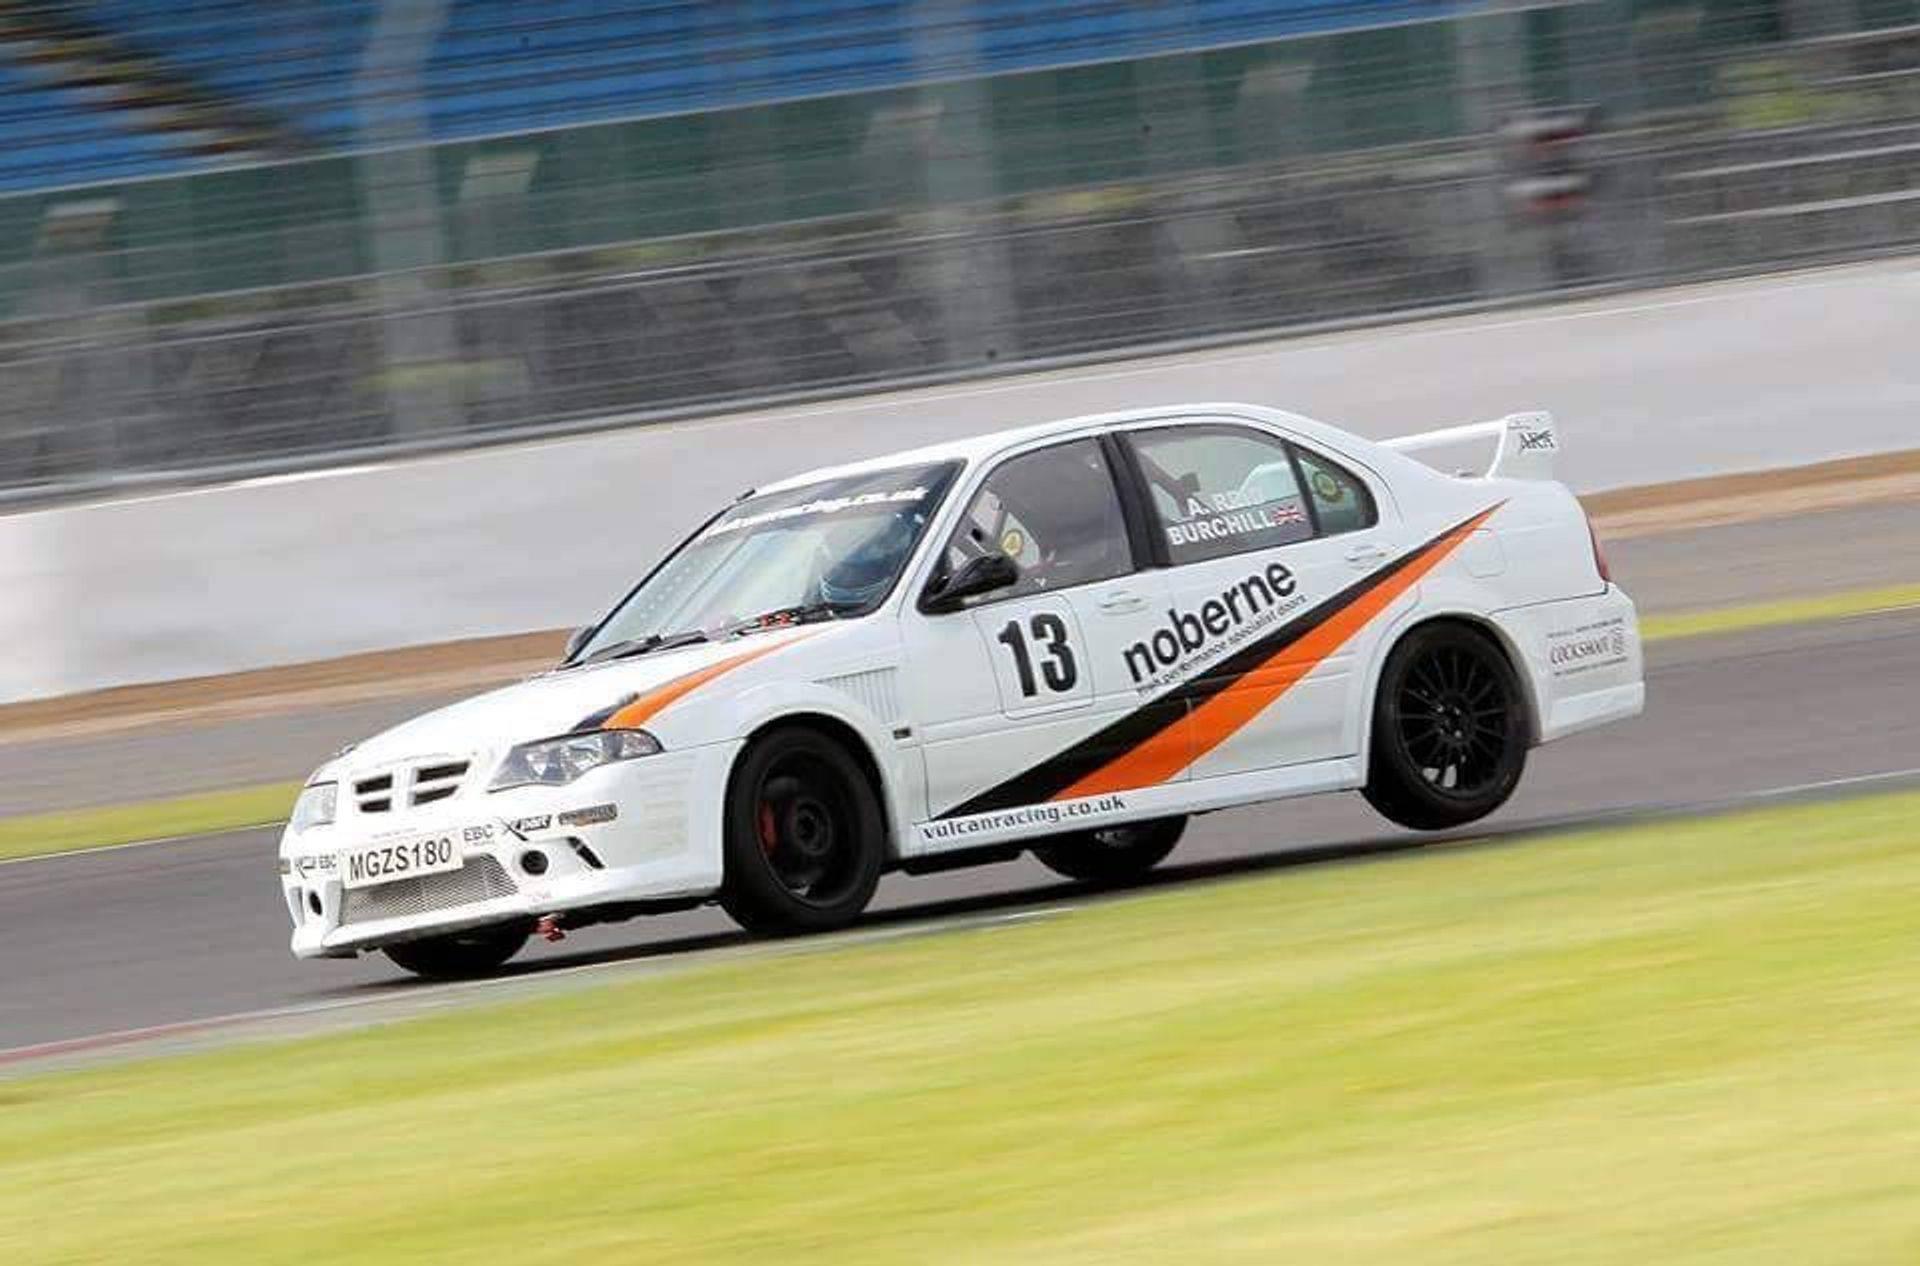 MGZS V6 180 Race Car Vulcan Racing MG Live Sivlerstone